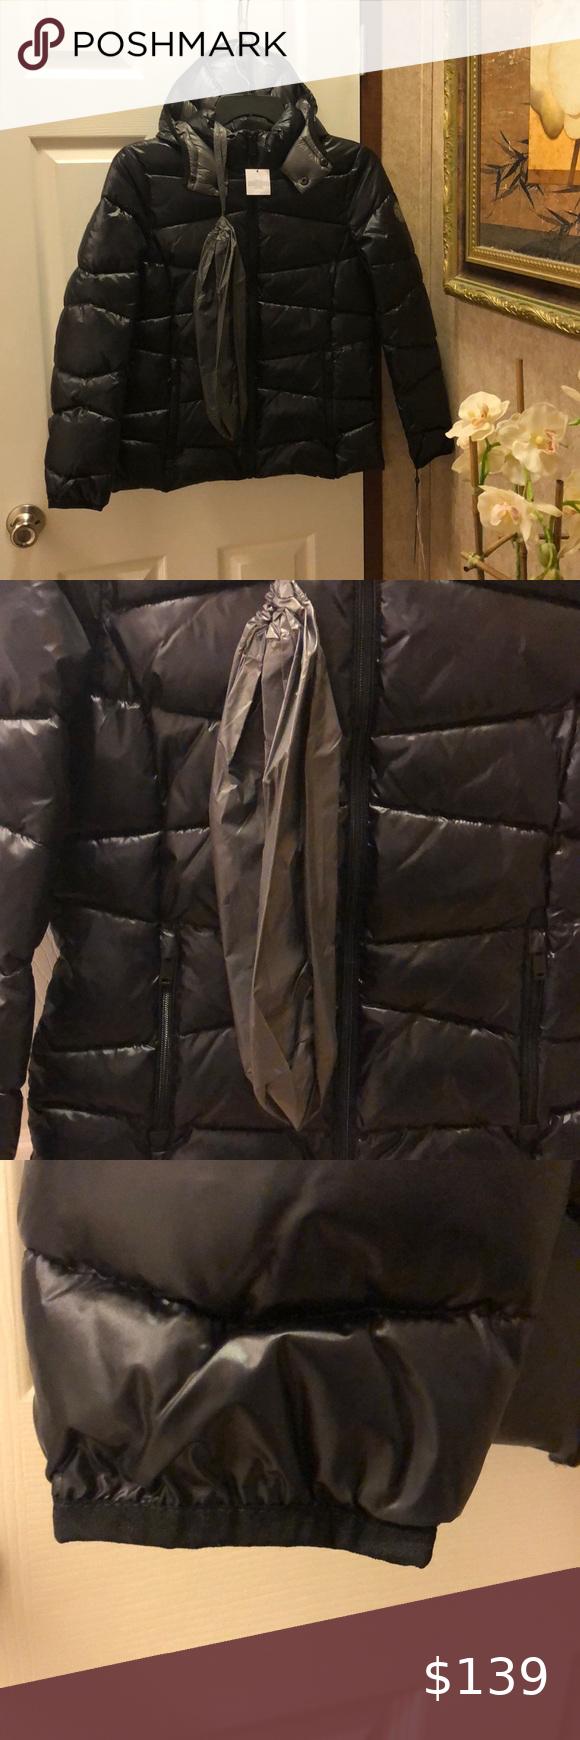 Brand New Dkny High Shine Puffer Jacket Dkny Puffer Jackets Puffer [ 1740 x 580 Pixel ]